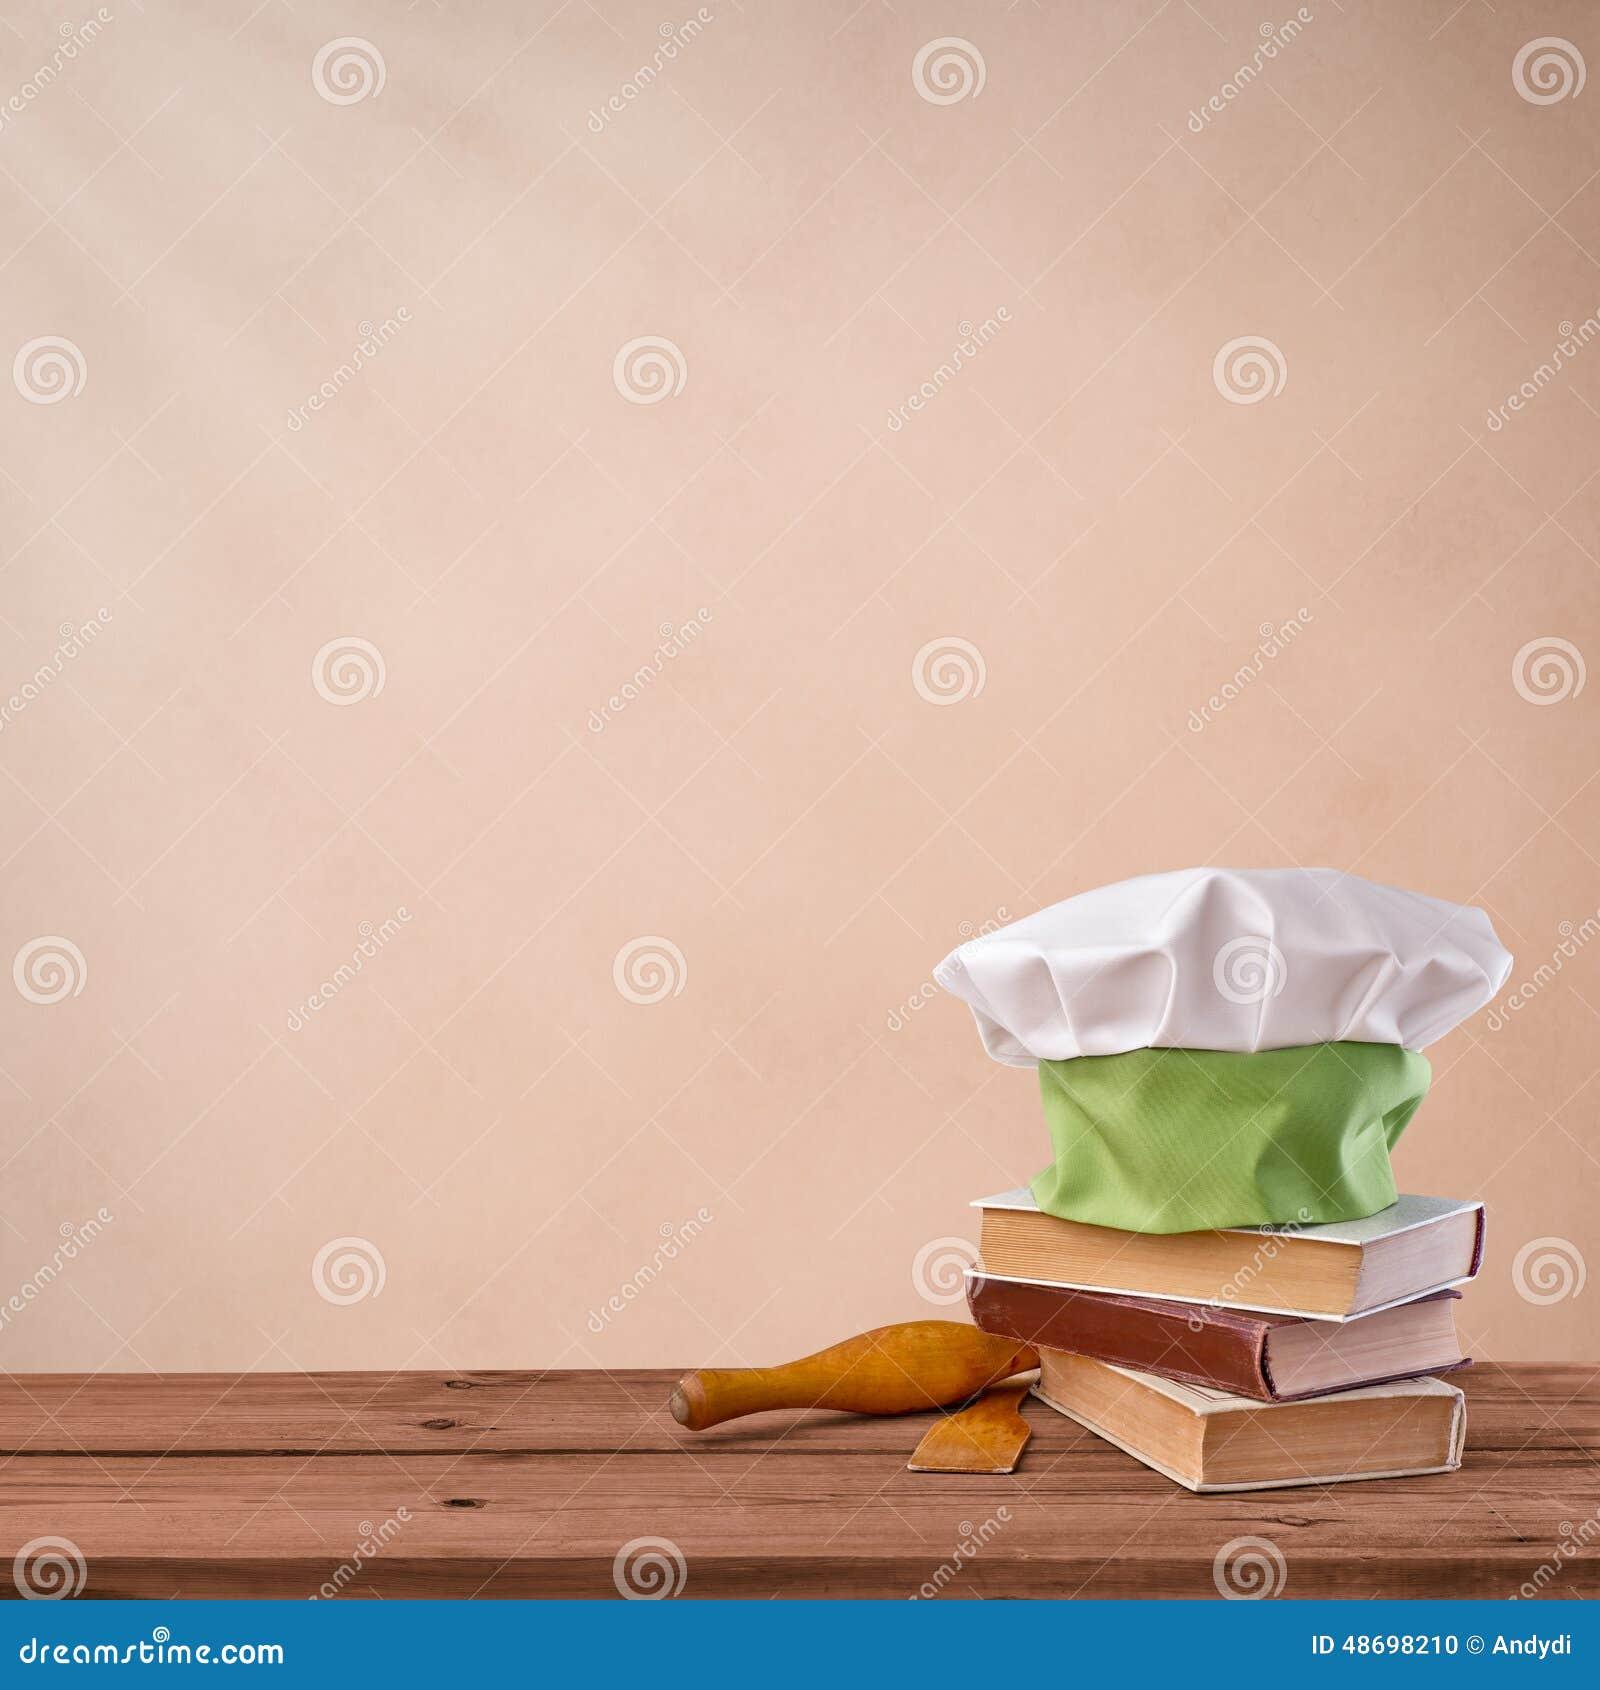 Cap chef, cookbook and kitchenware on beige vintage texture background ...